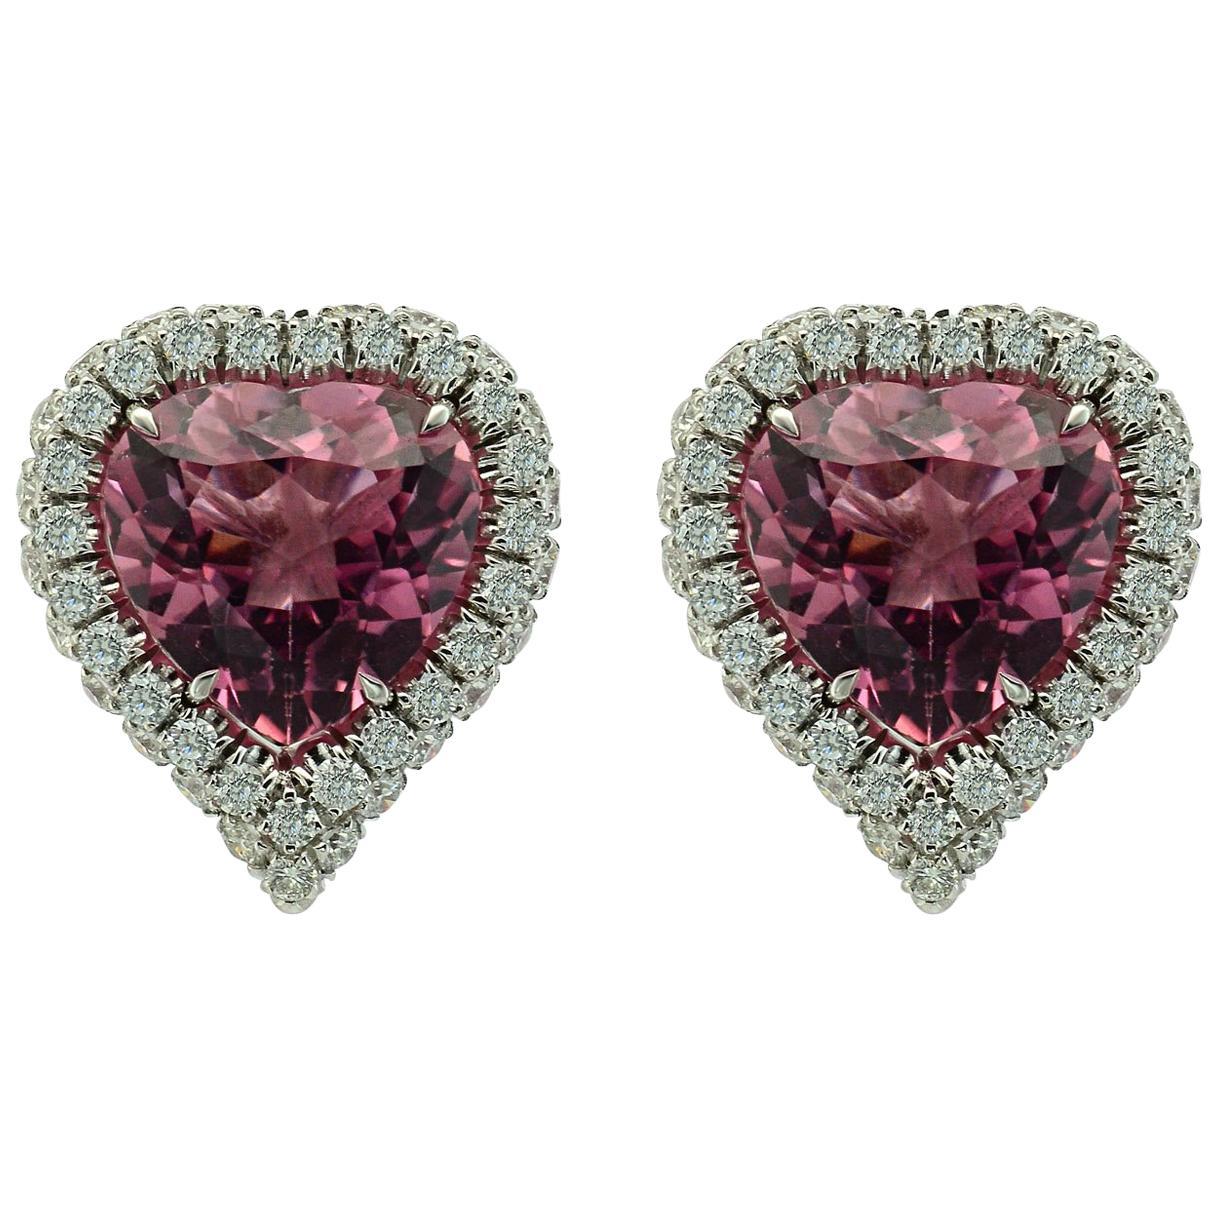 Heart Shaped Pink Tourmaline Diamond 18KT White Gold Earrings